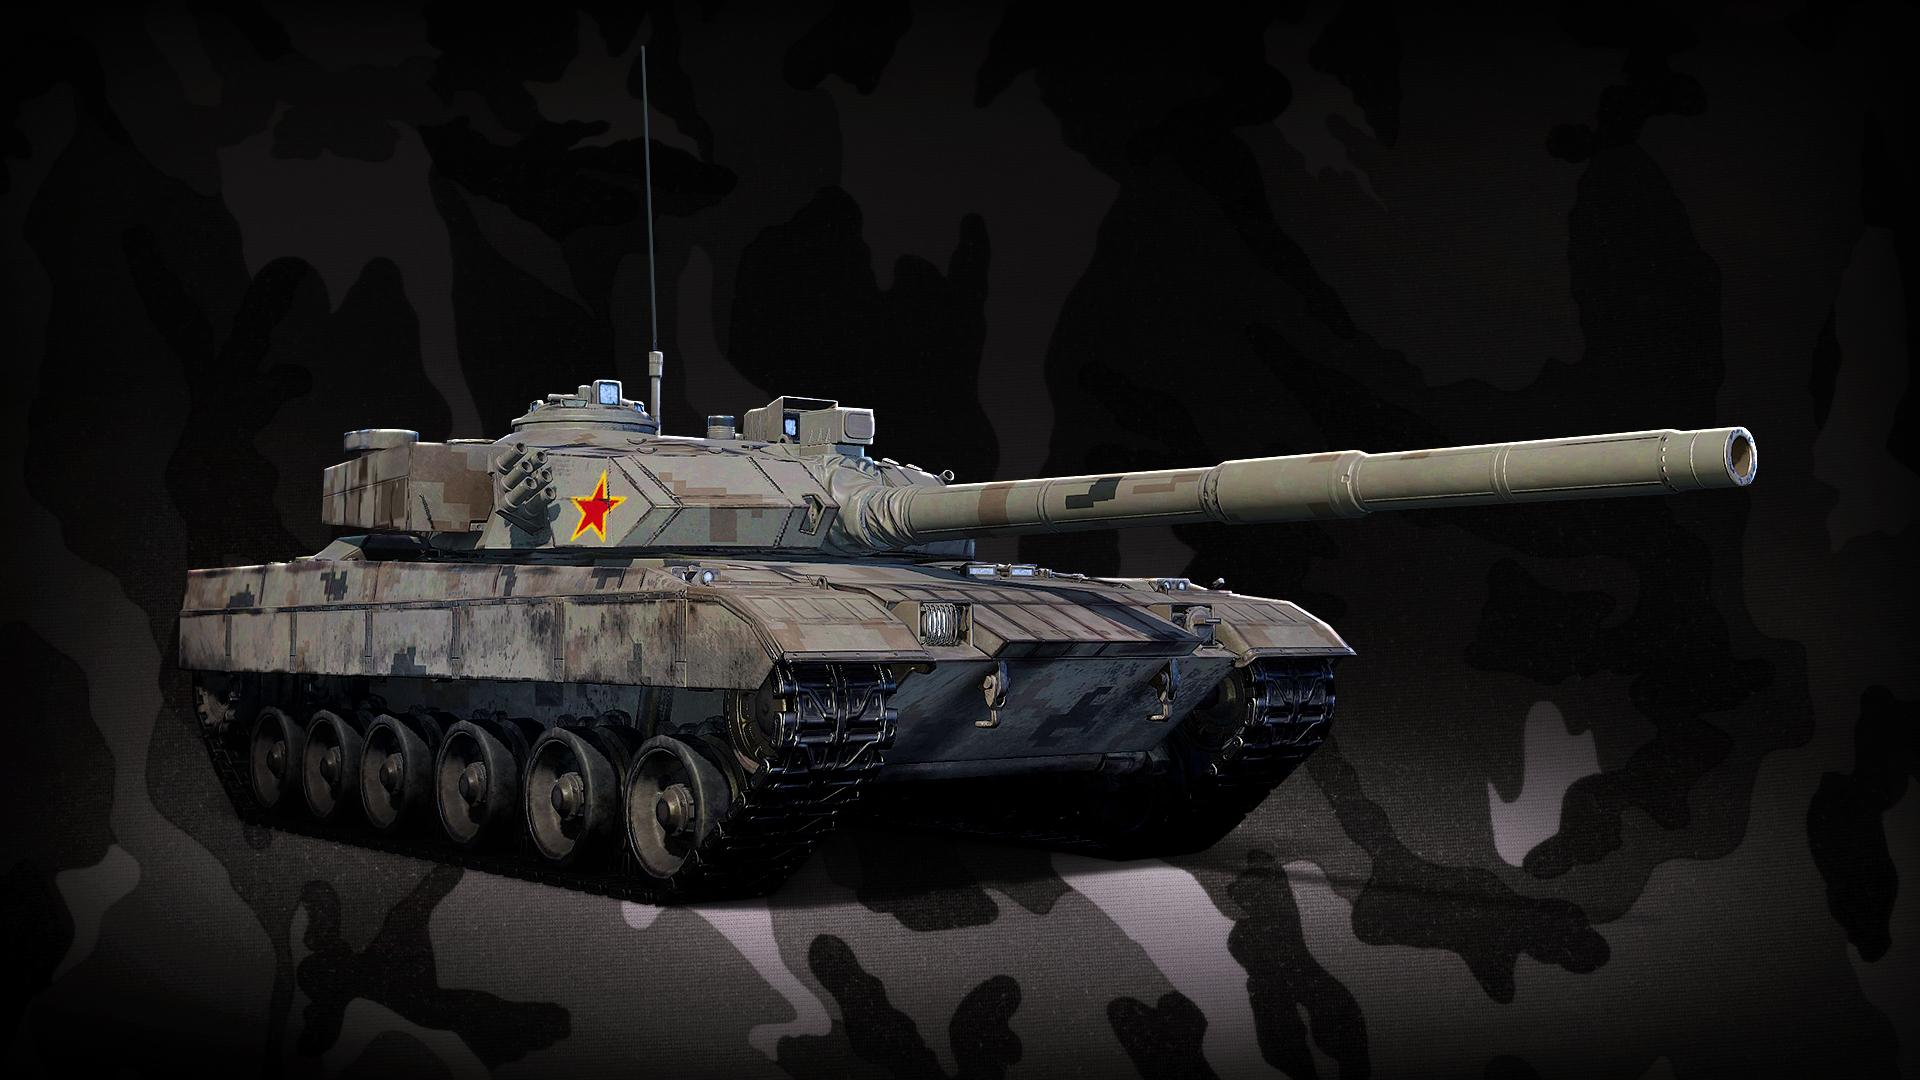 Dec 22, 2017 Tank of the Week: Type 96B Armored Warfare